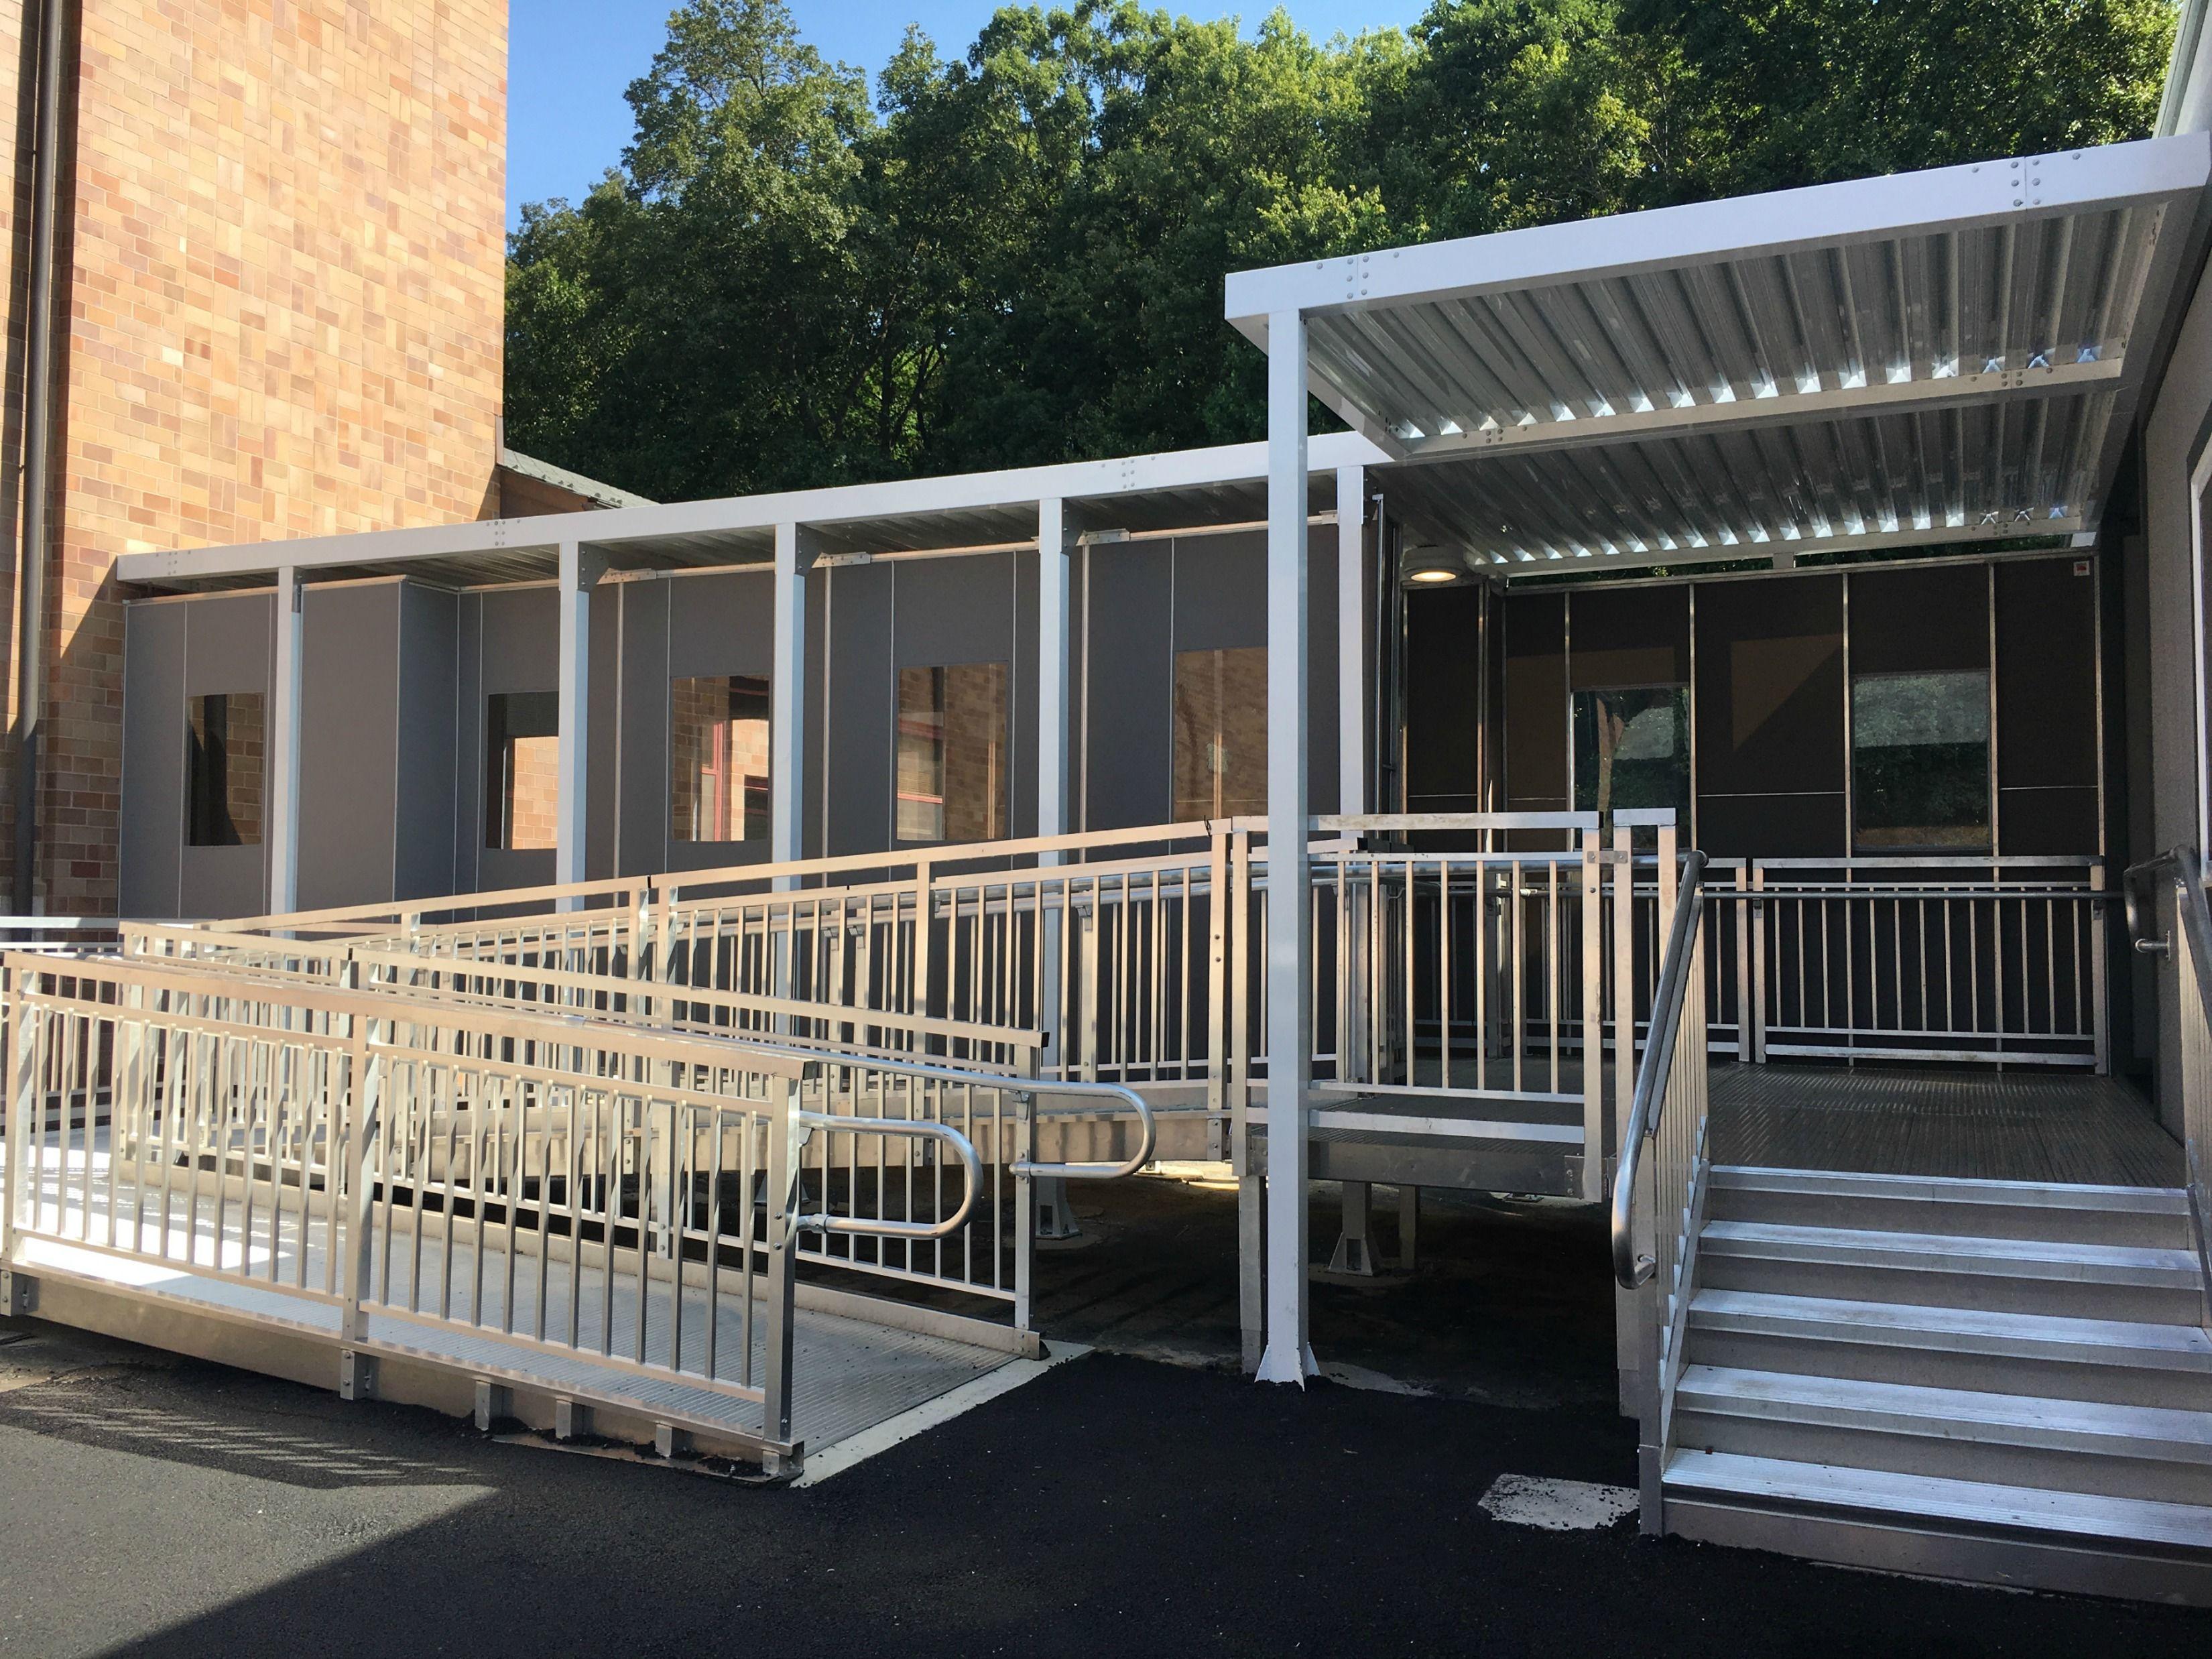 Walkway Enclosure Panels With Images Walkway Paneling Enclosure